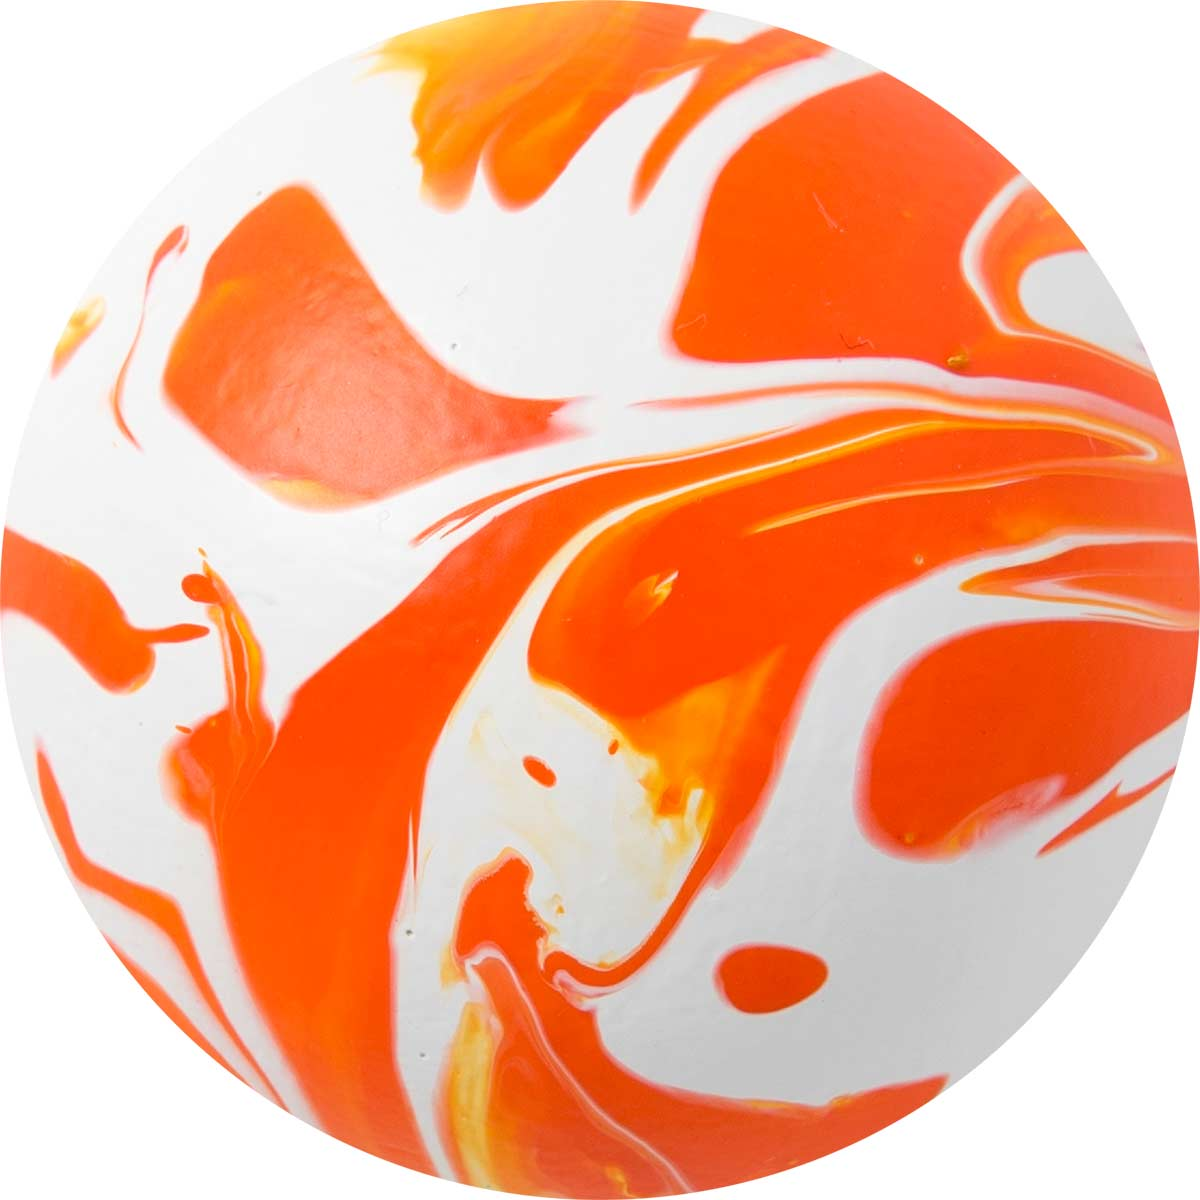 FolkArt ® Marbling Paint - Orange, 2 oz. - 16940